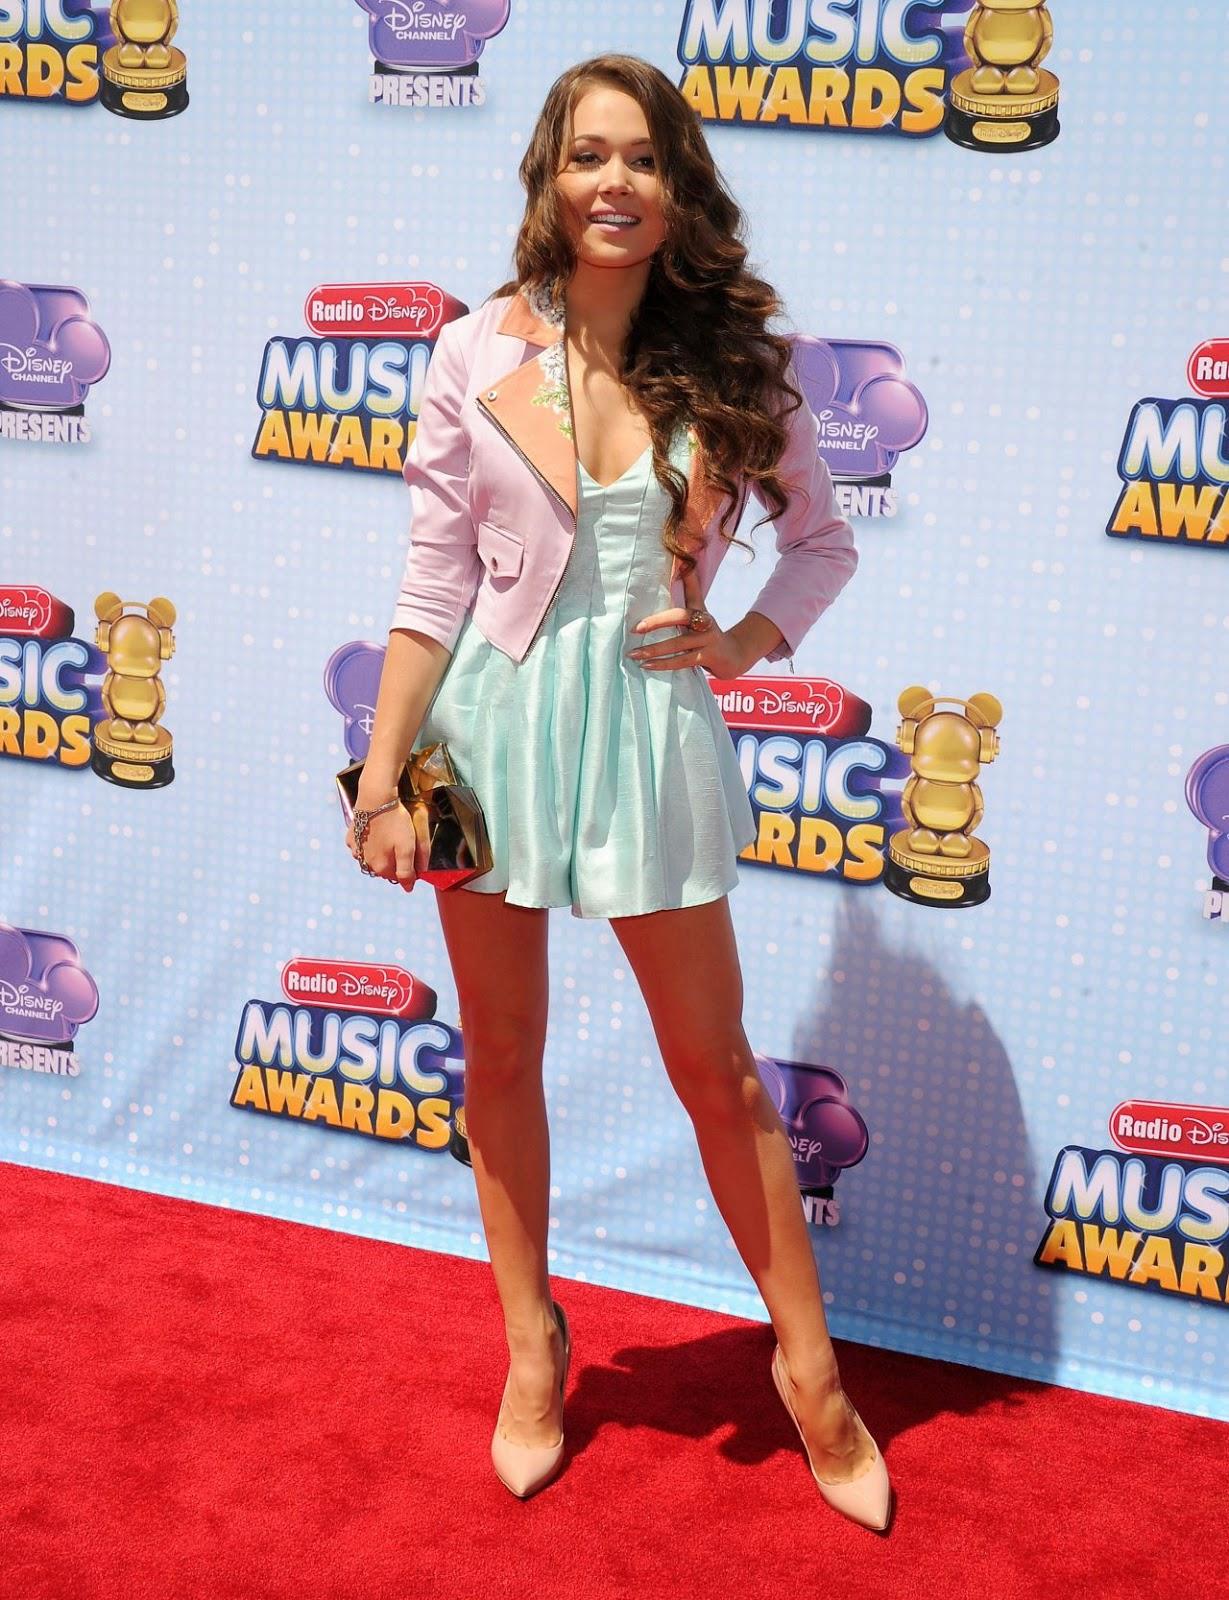 Kelli Berglund shows off long legs at the 2014 Radio Disney Music Awards